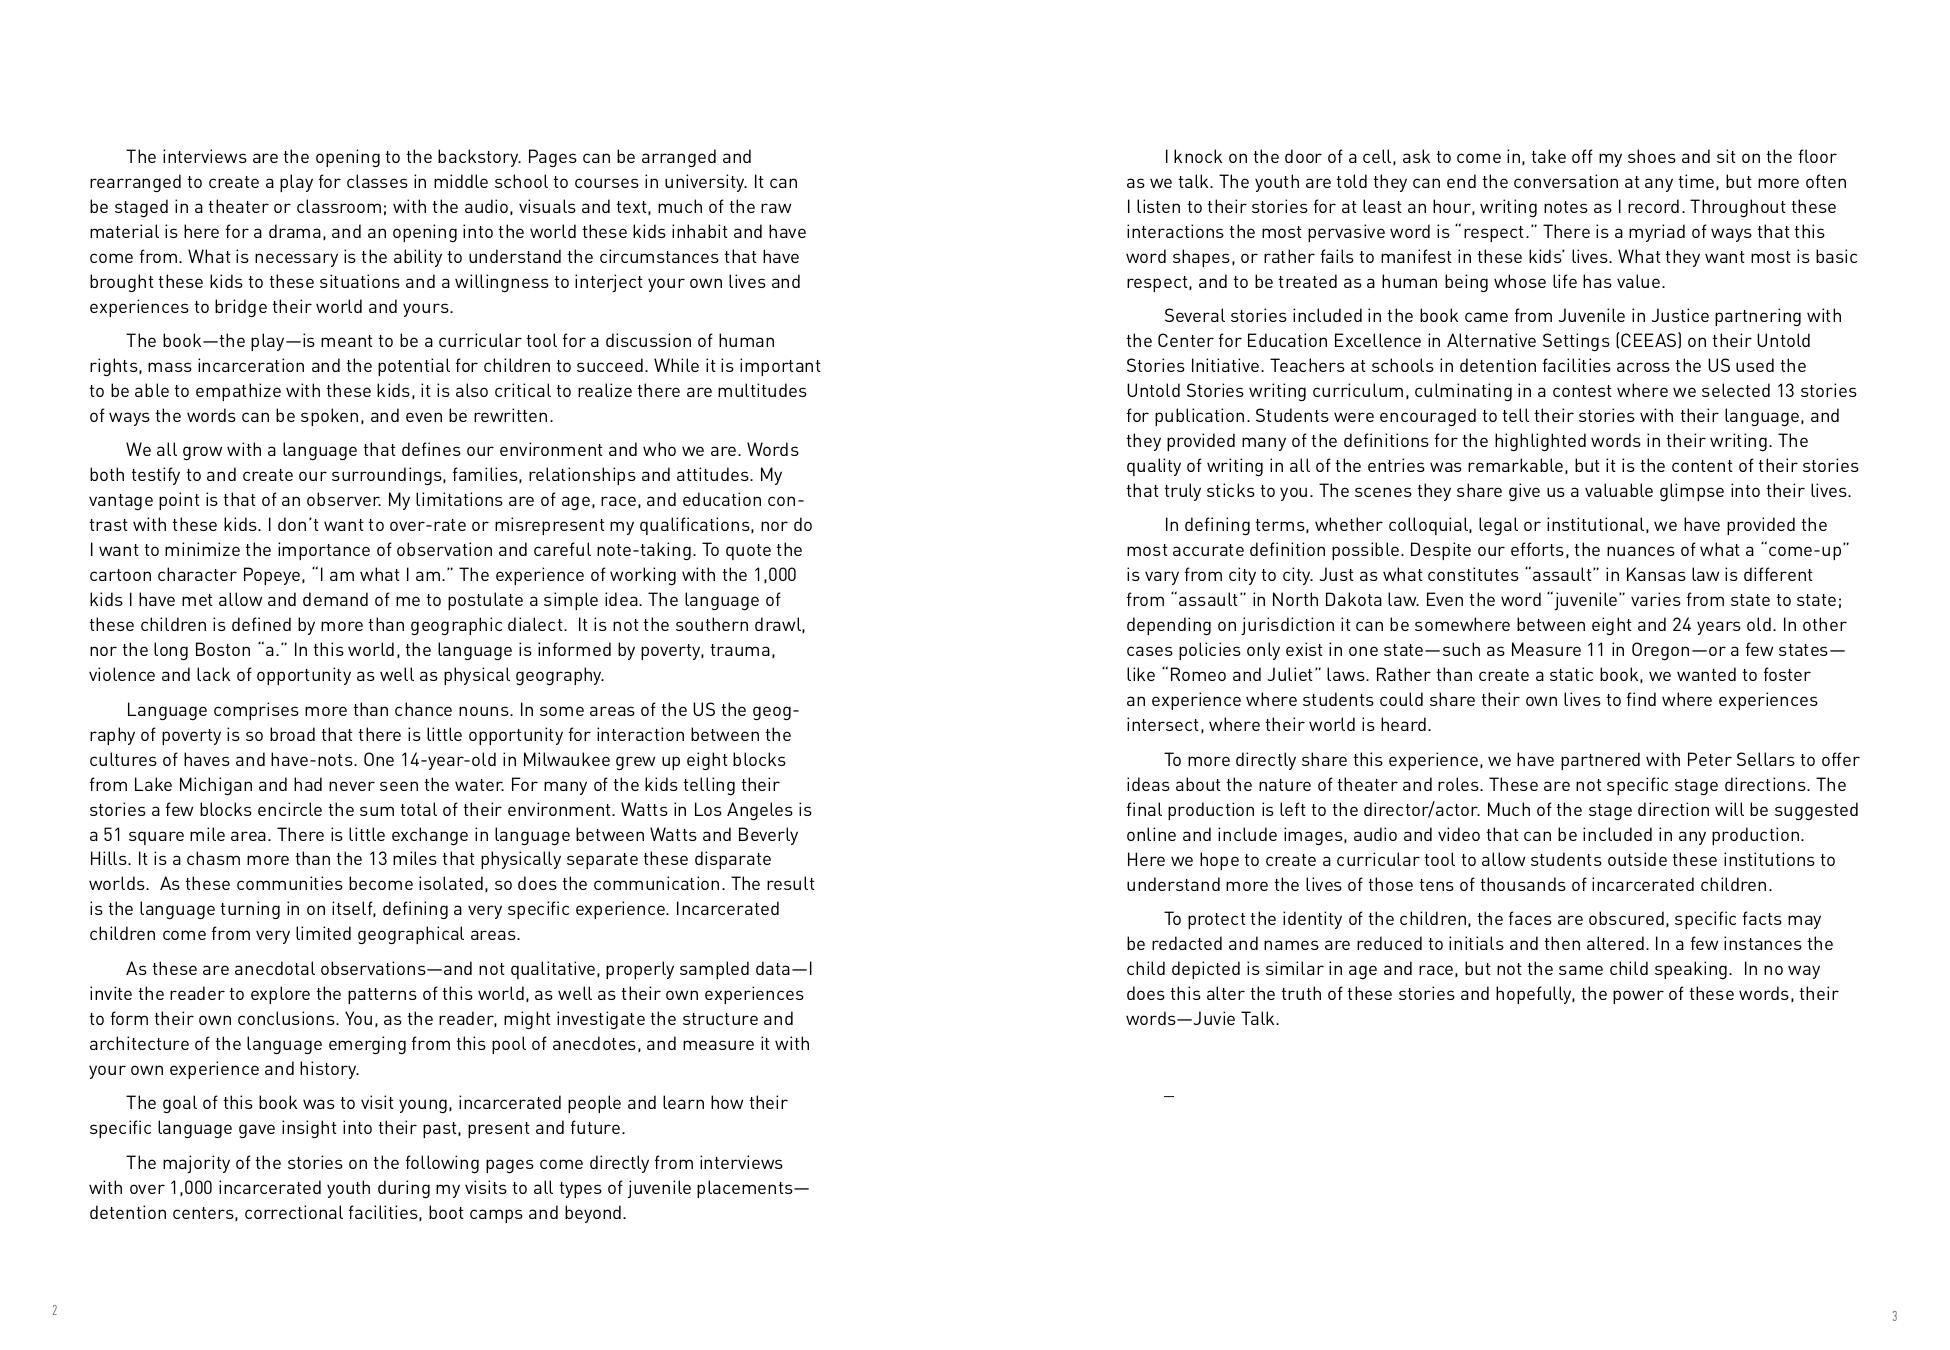 Juvie Talk - Aug 262.jpg